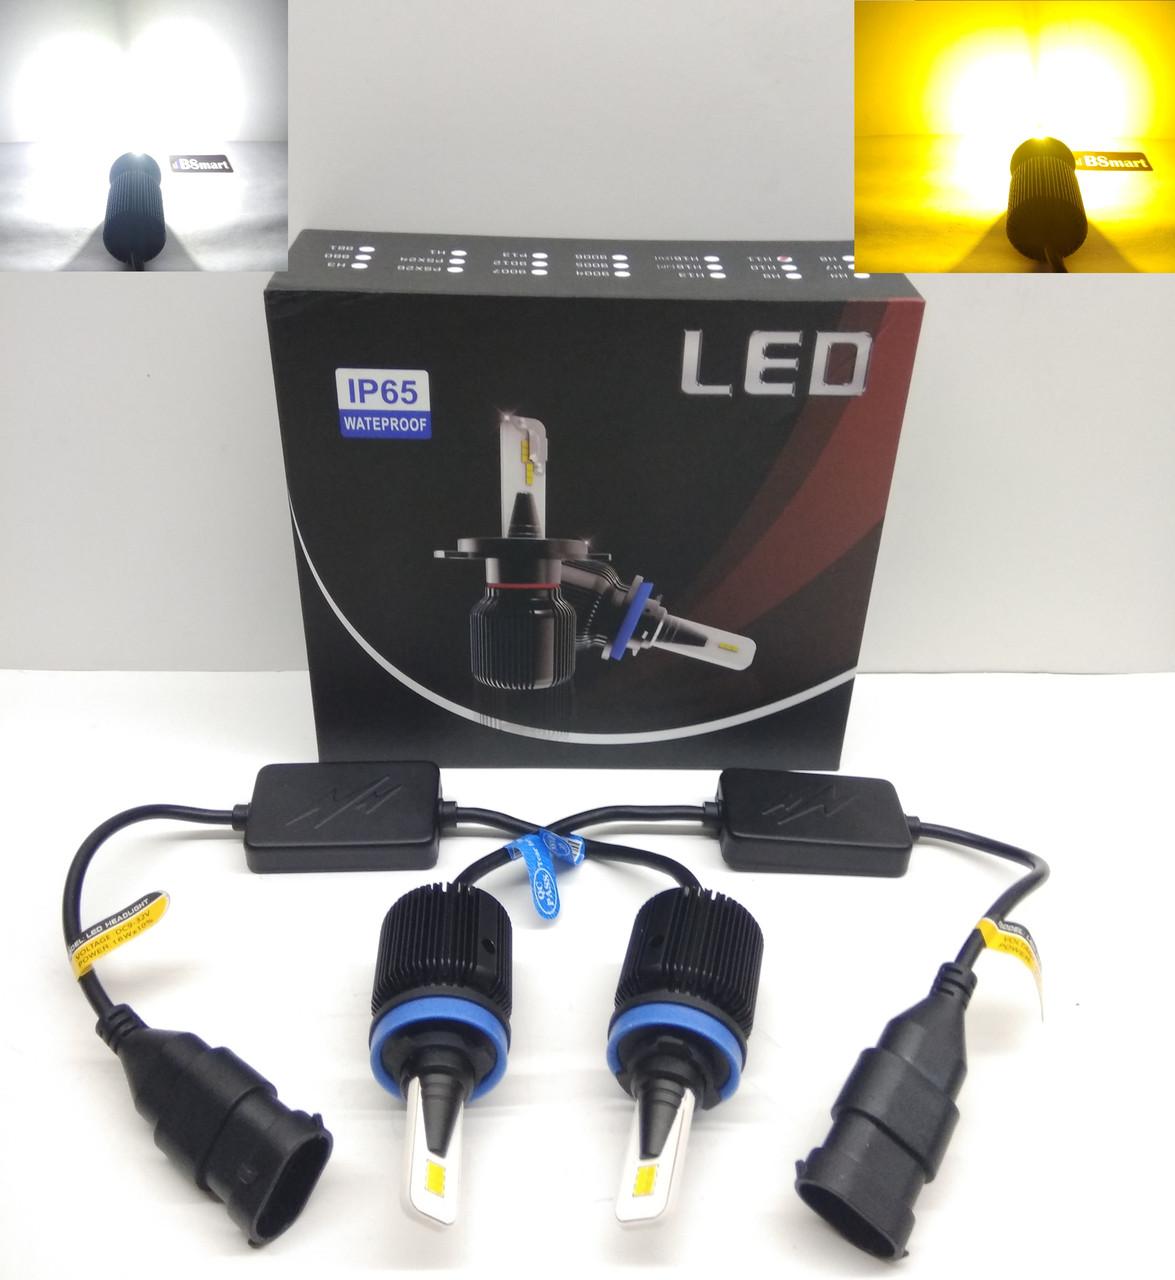 Автолампы LED M1 CSP Dual Color, H11, 8000LM, 40W, 9-32V